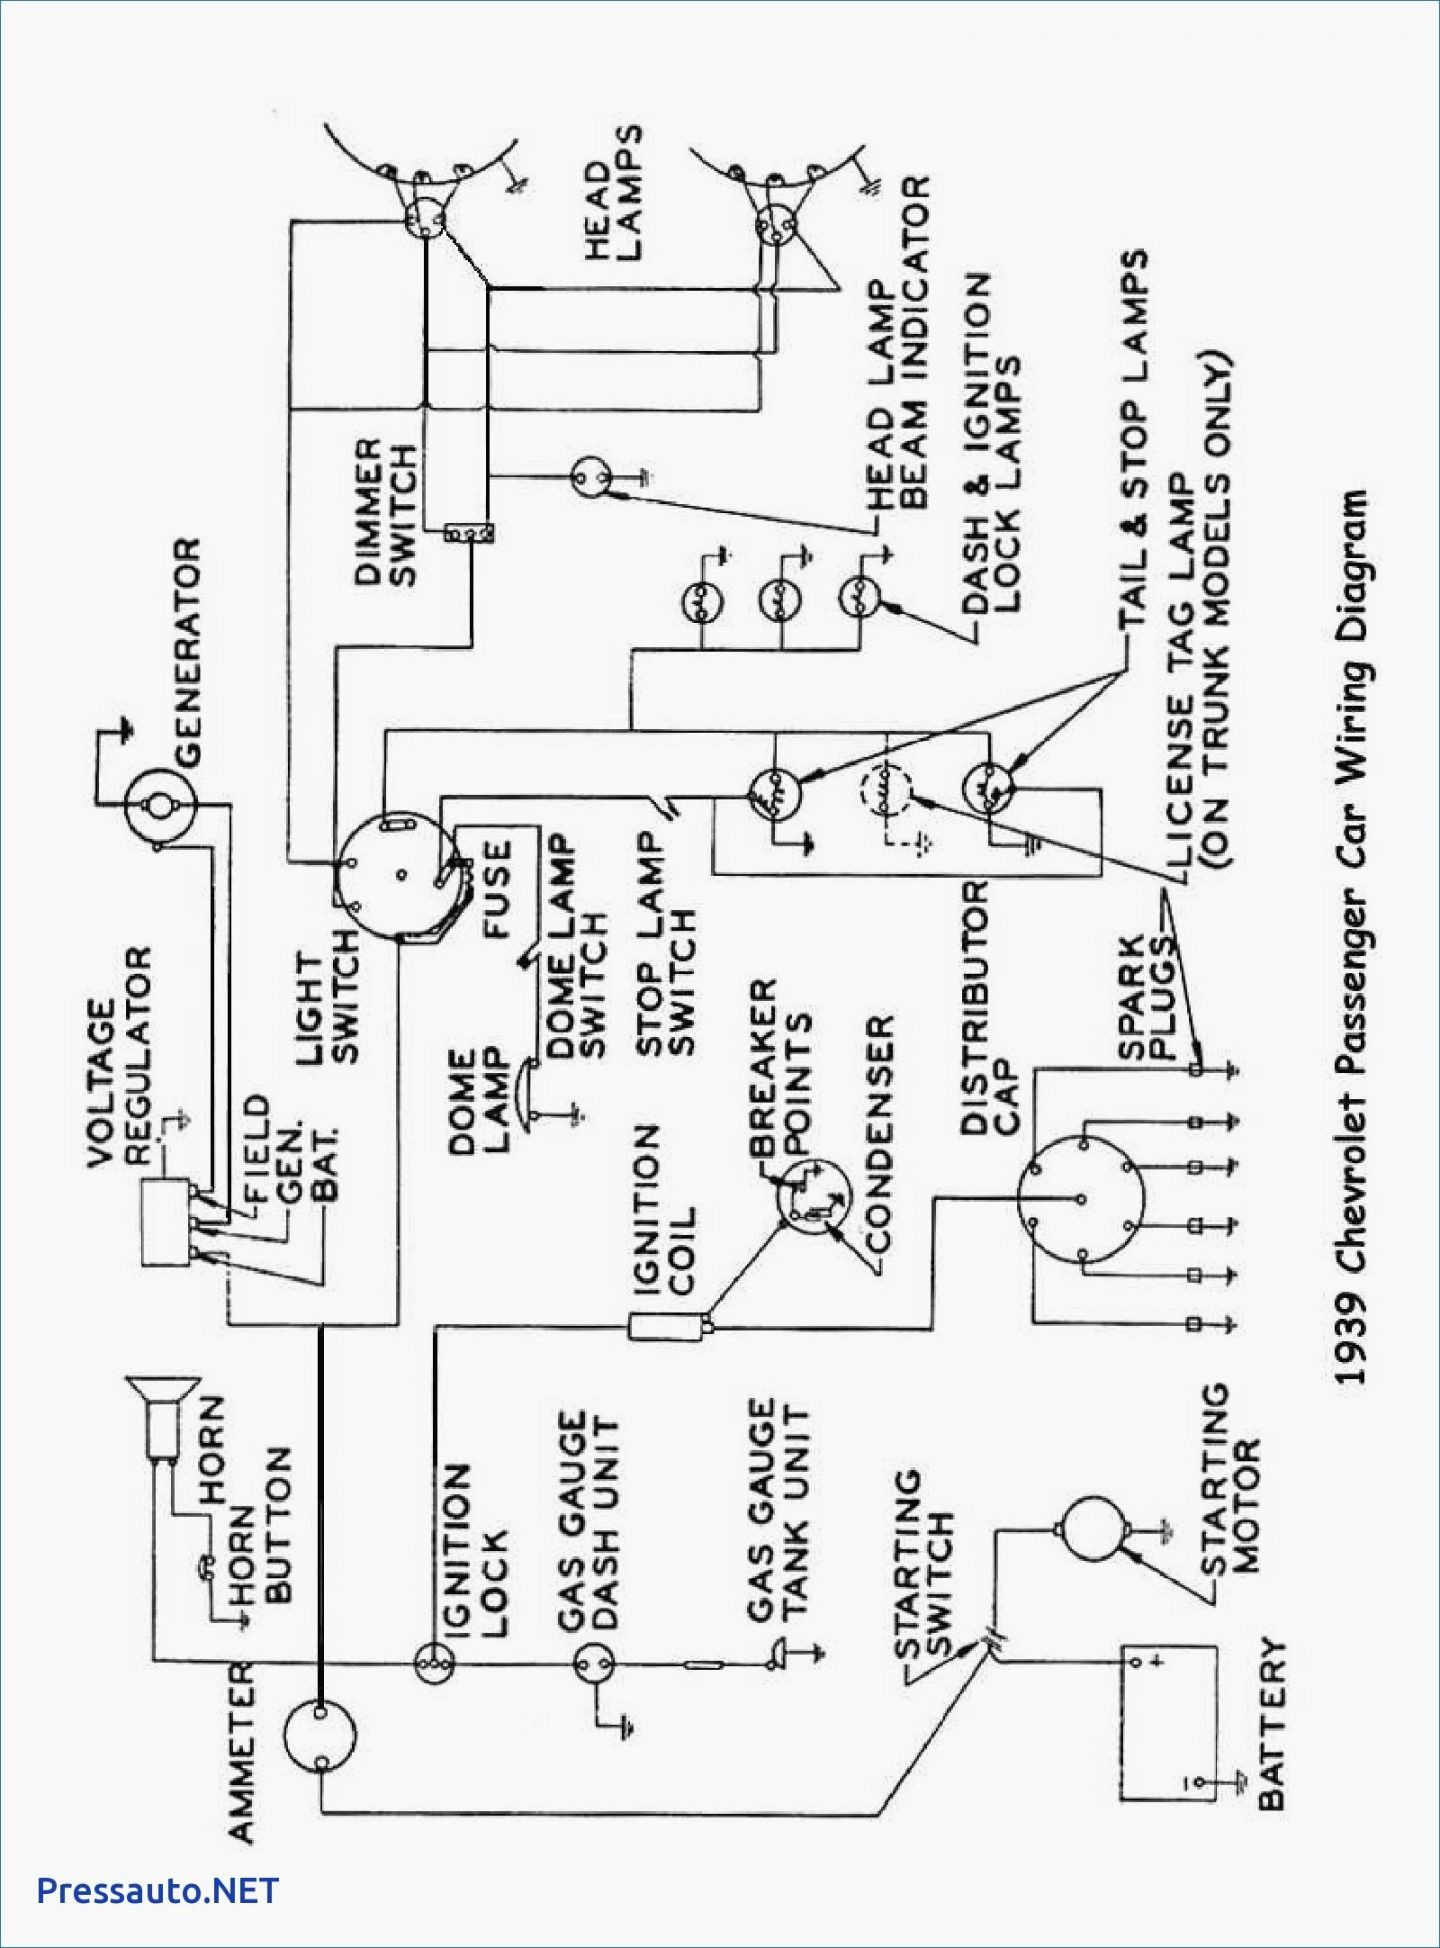 small resolution of wiring diagram welding machine inspirationa best of pdf circuitwiring diagram welding machine inspirationa best of pdf